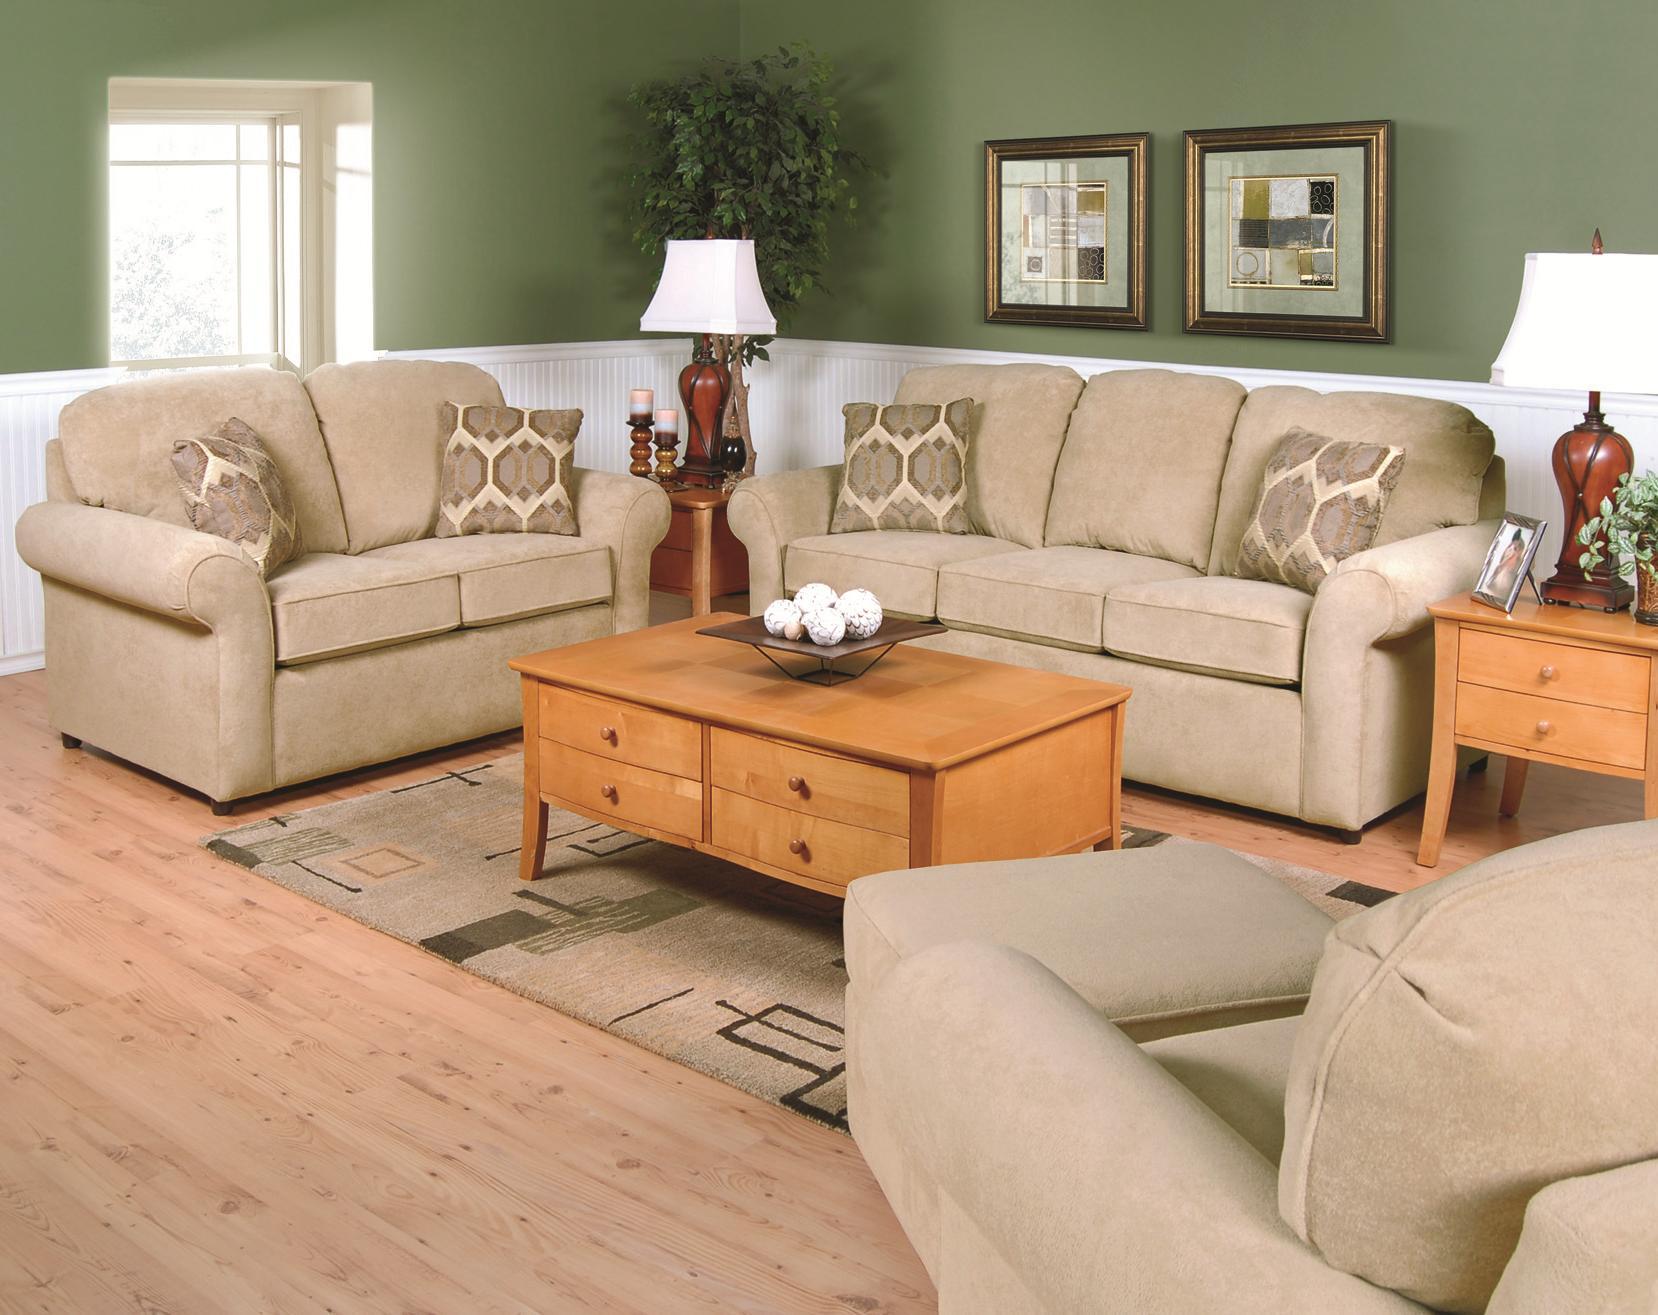 England Malibu 2405 Casual Styled Sofa for Family Rooms ...